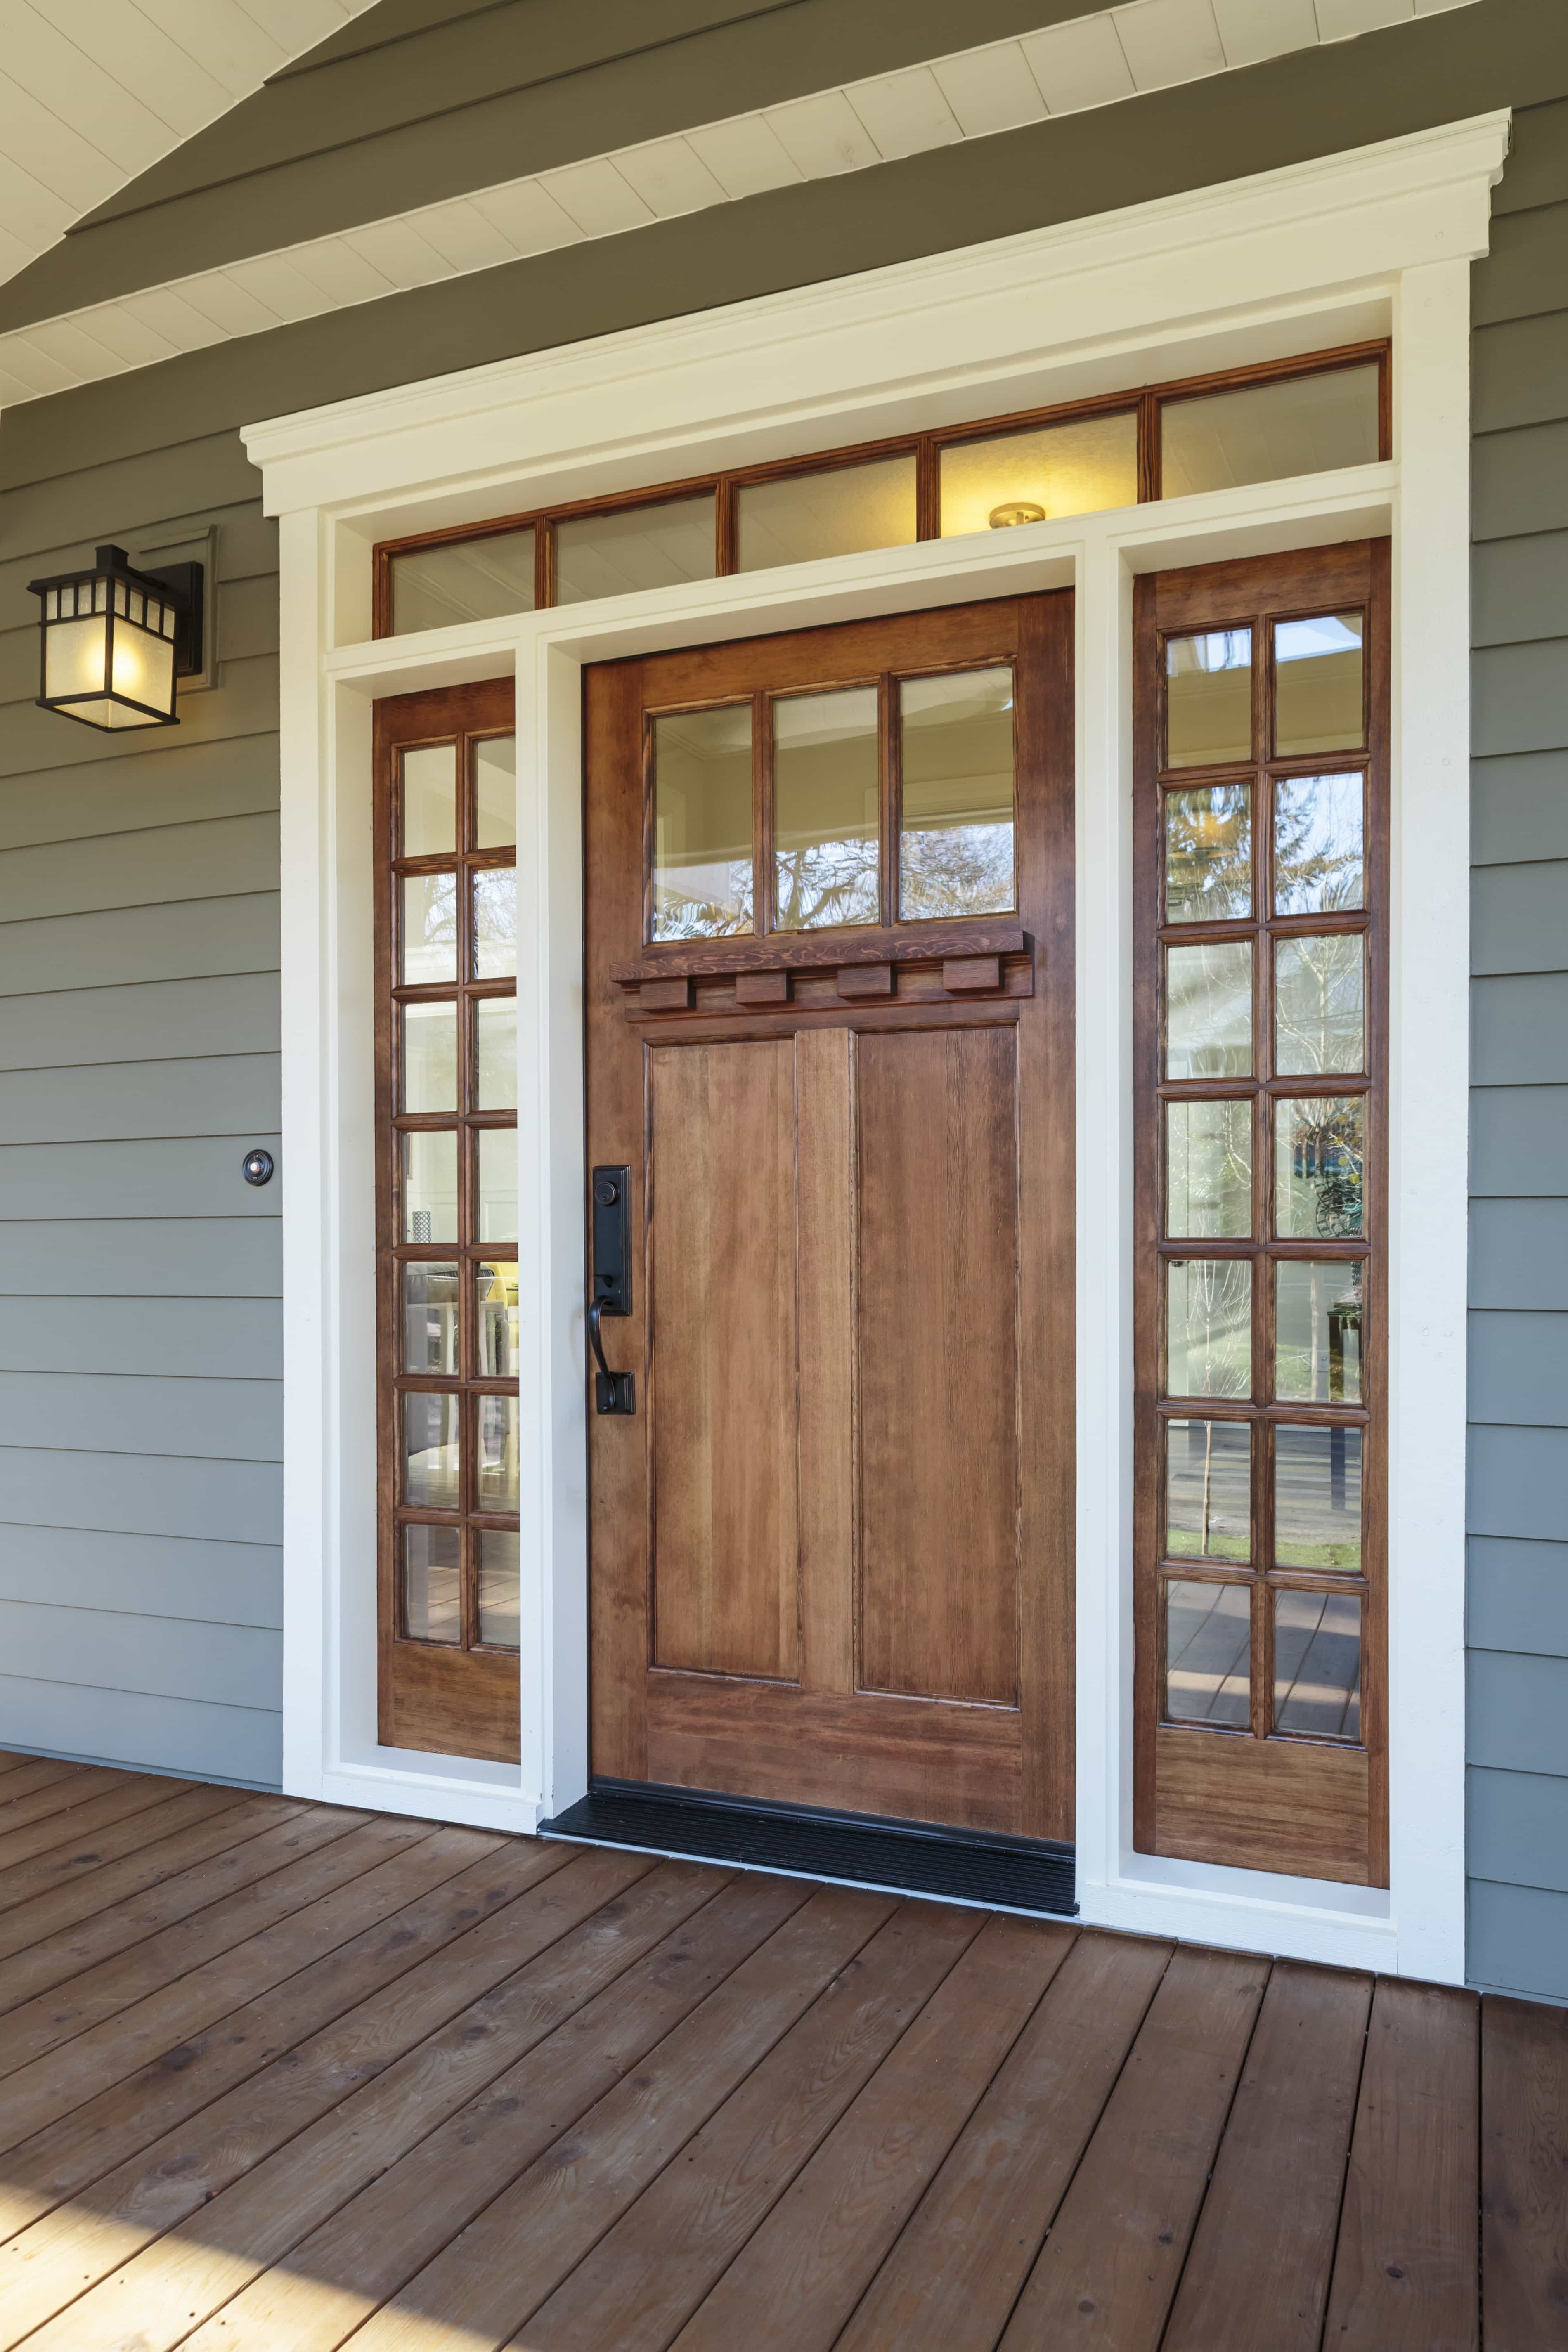 Simpson Fiberglass Exterior Doors Craftsman Front Doors House Front Door House Exterior